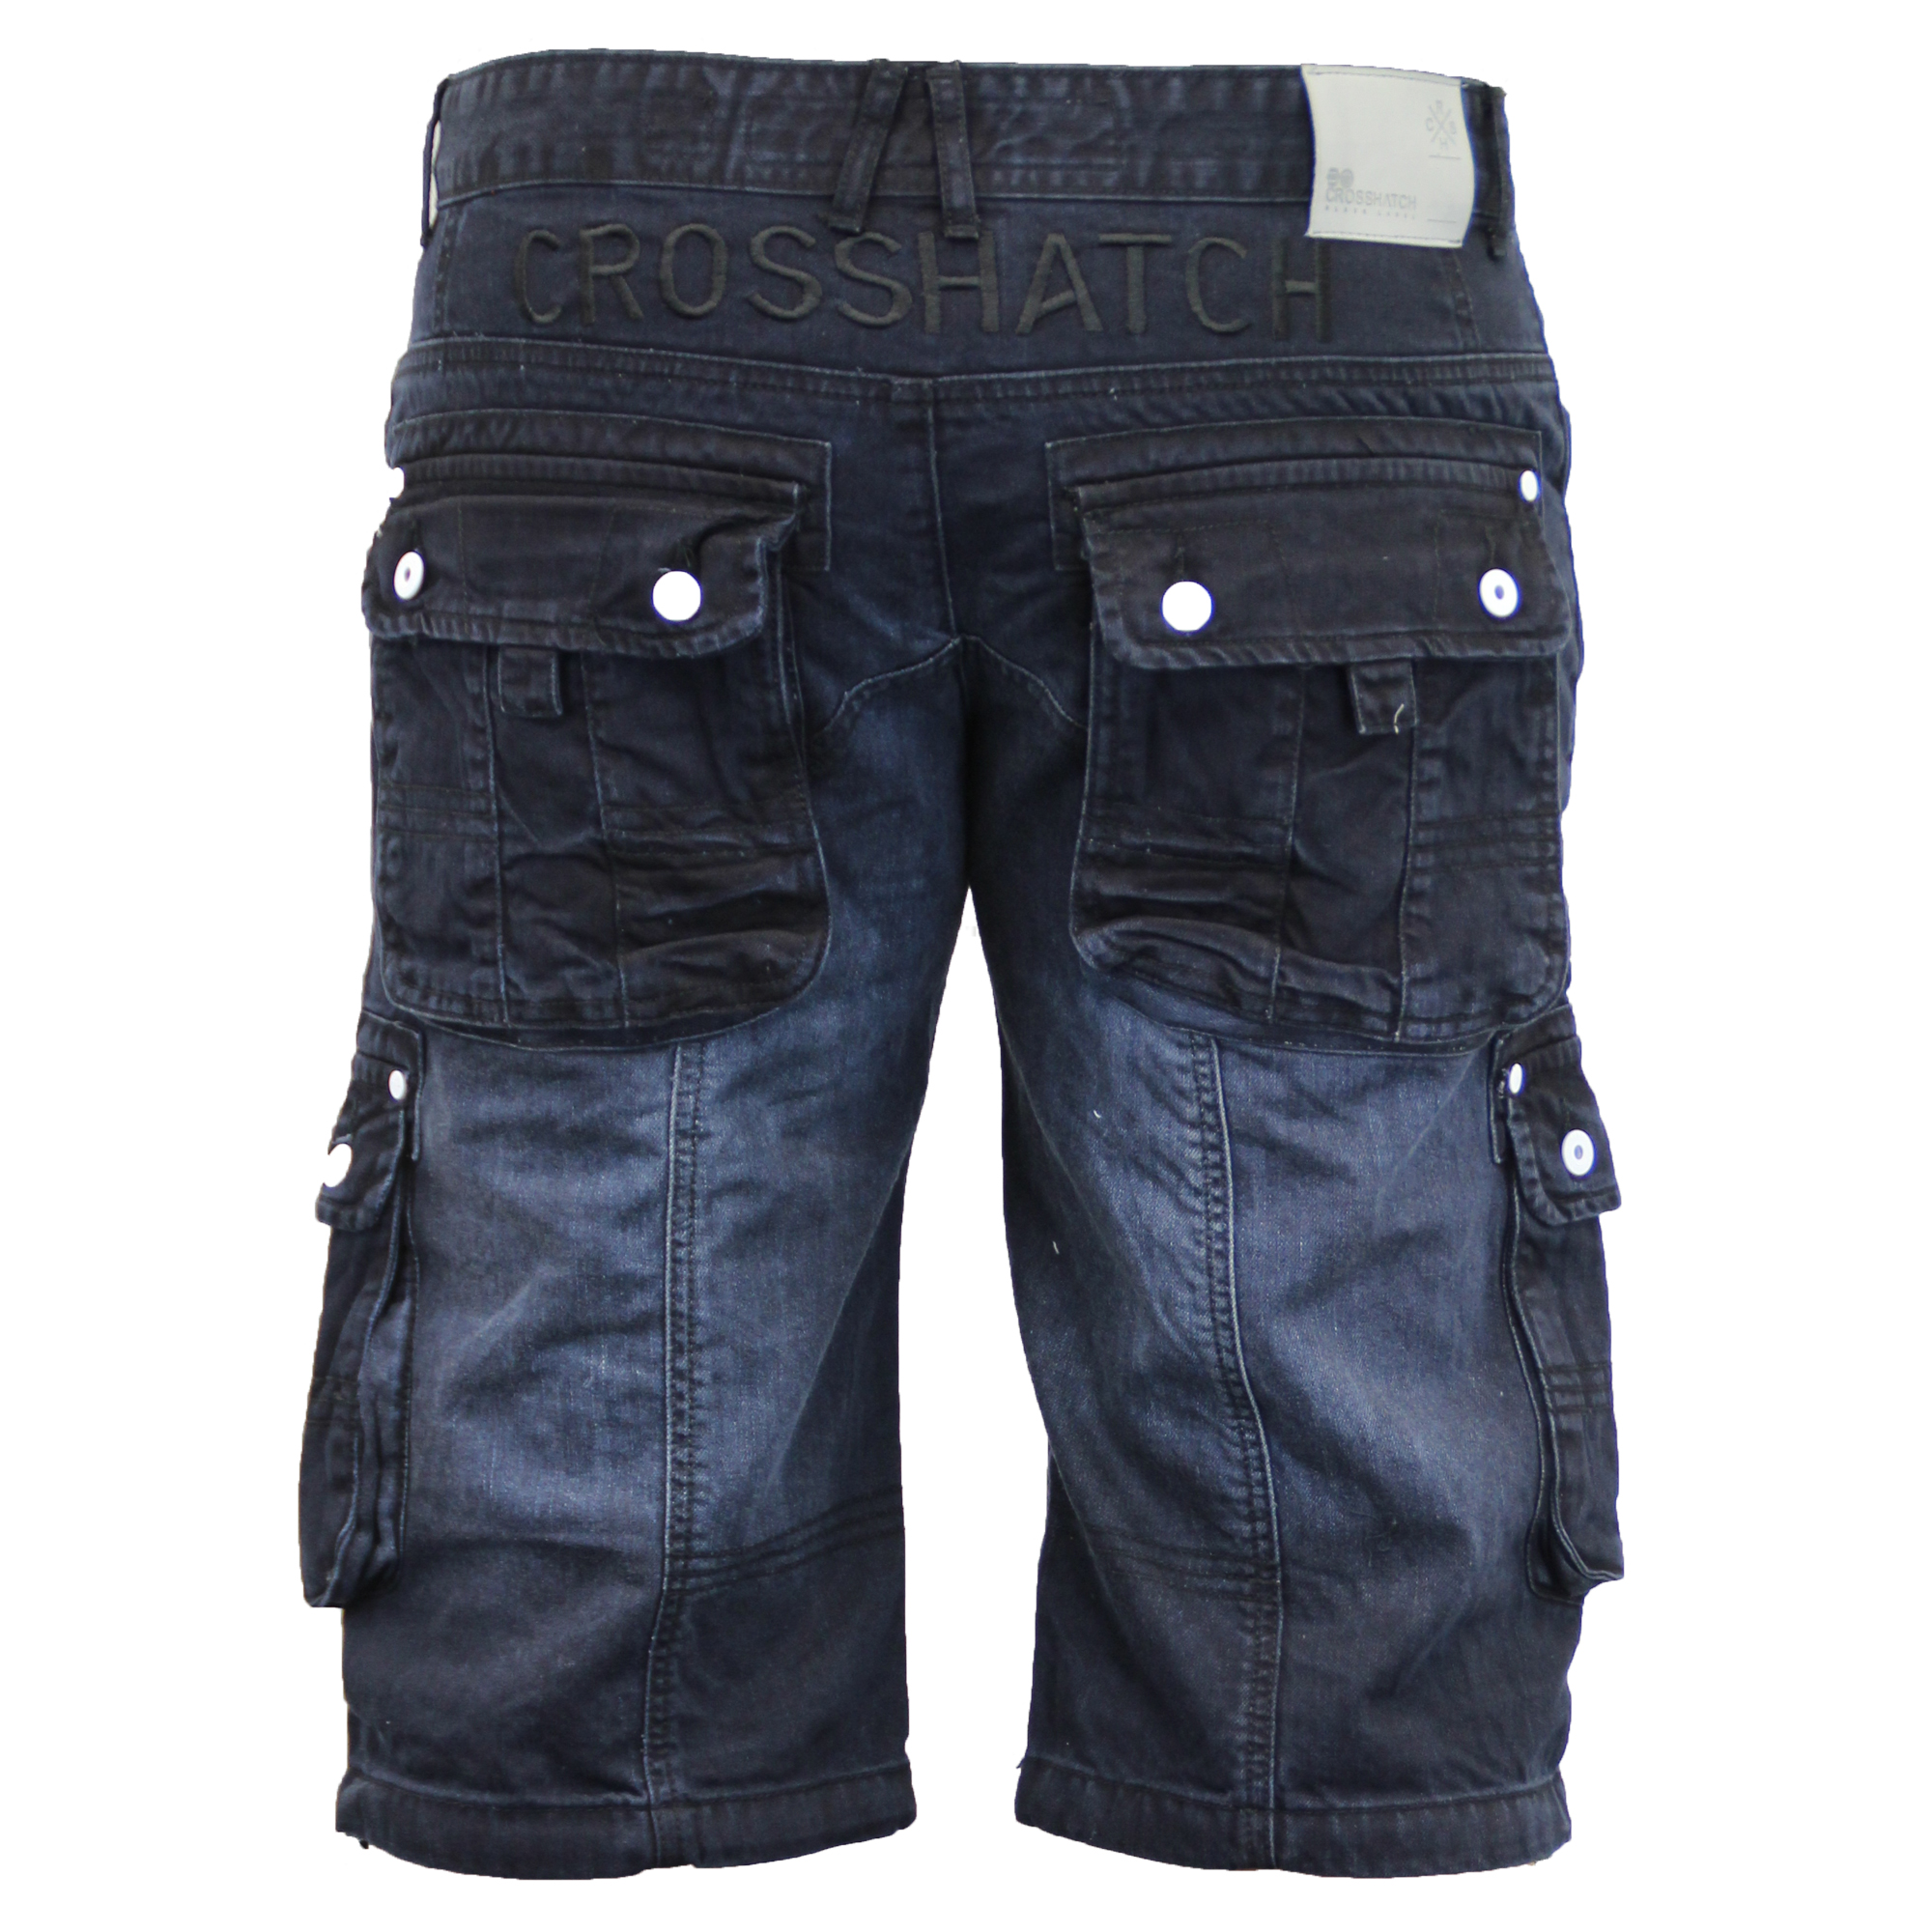 Mens-Denim-Knee-Length-Combat-Shorts-By-Crosshatch thumbnail 4